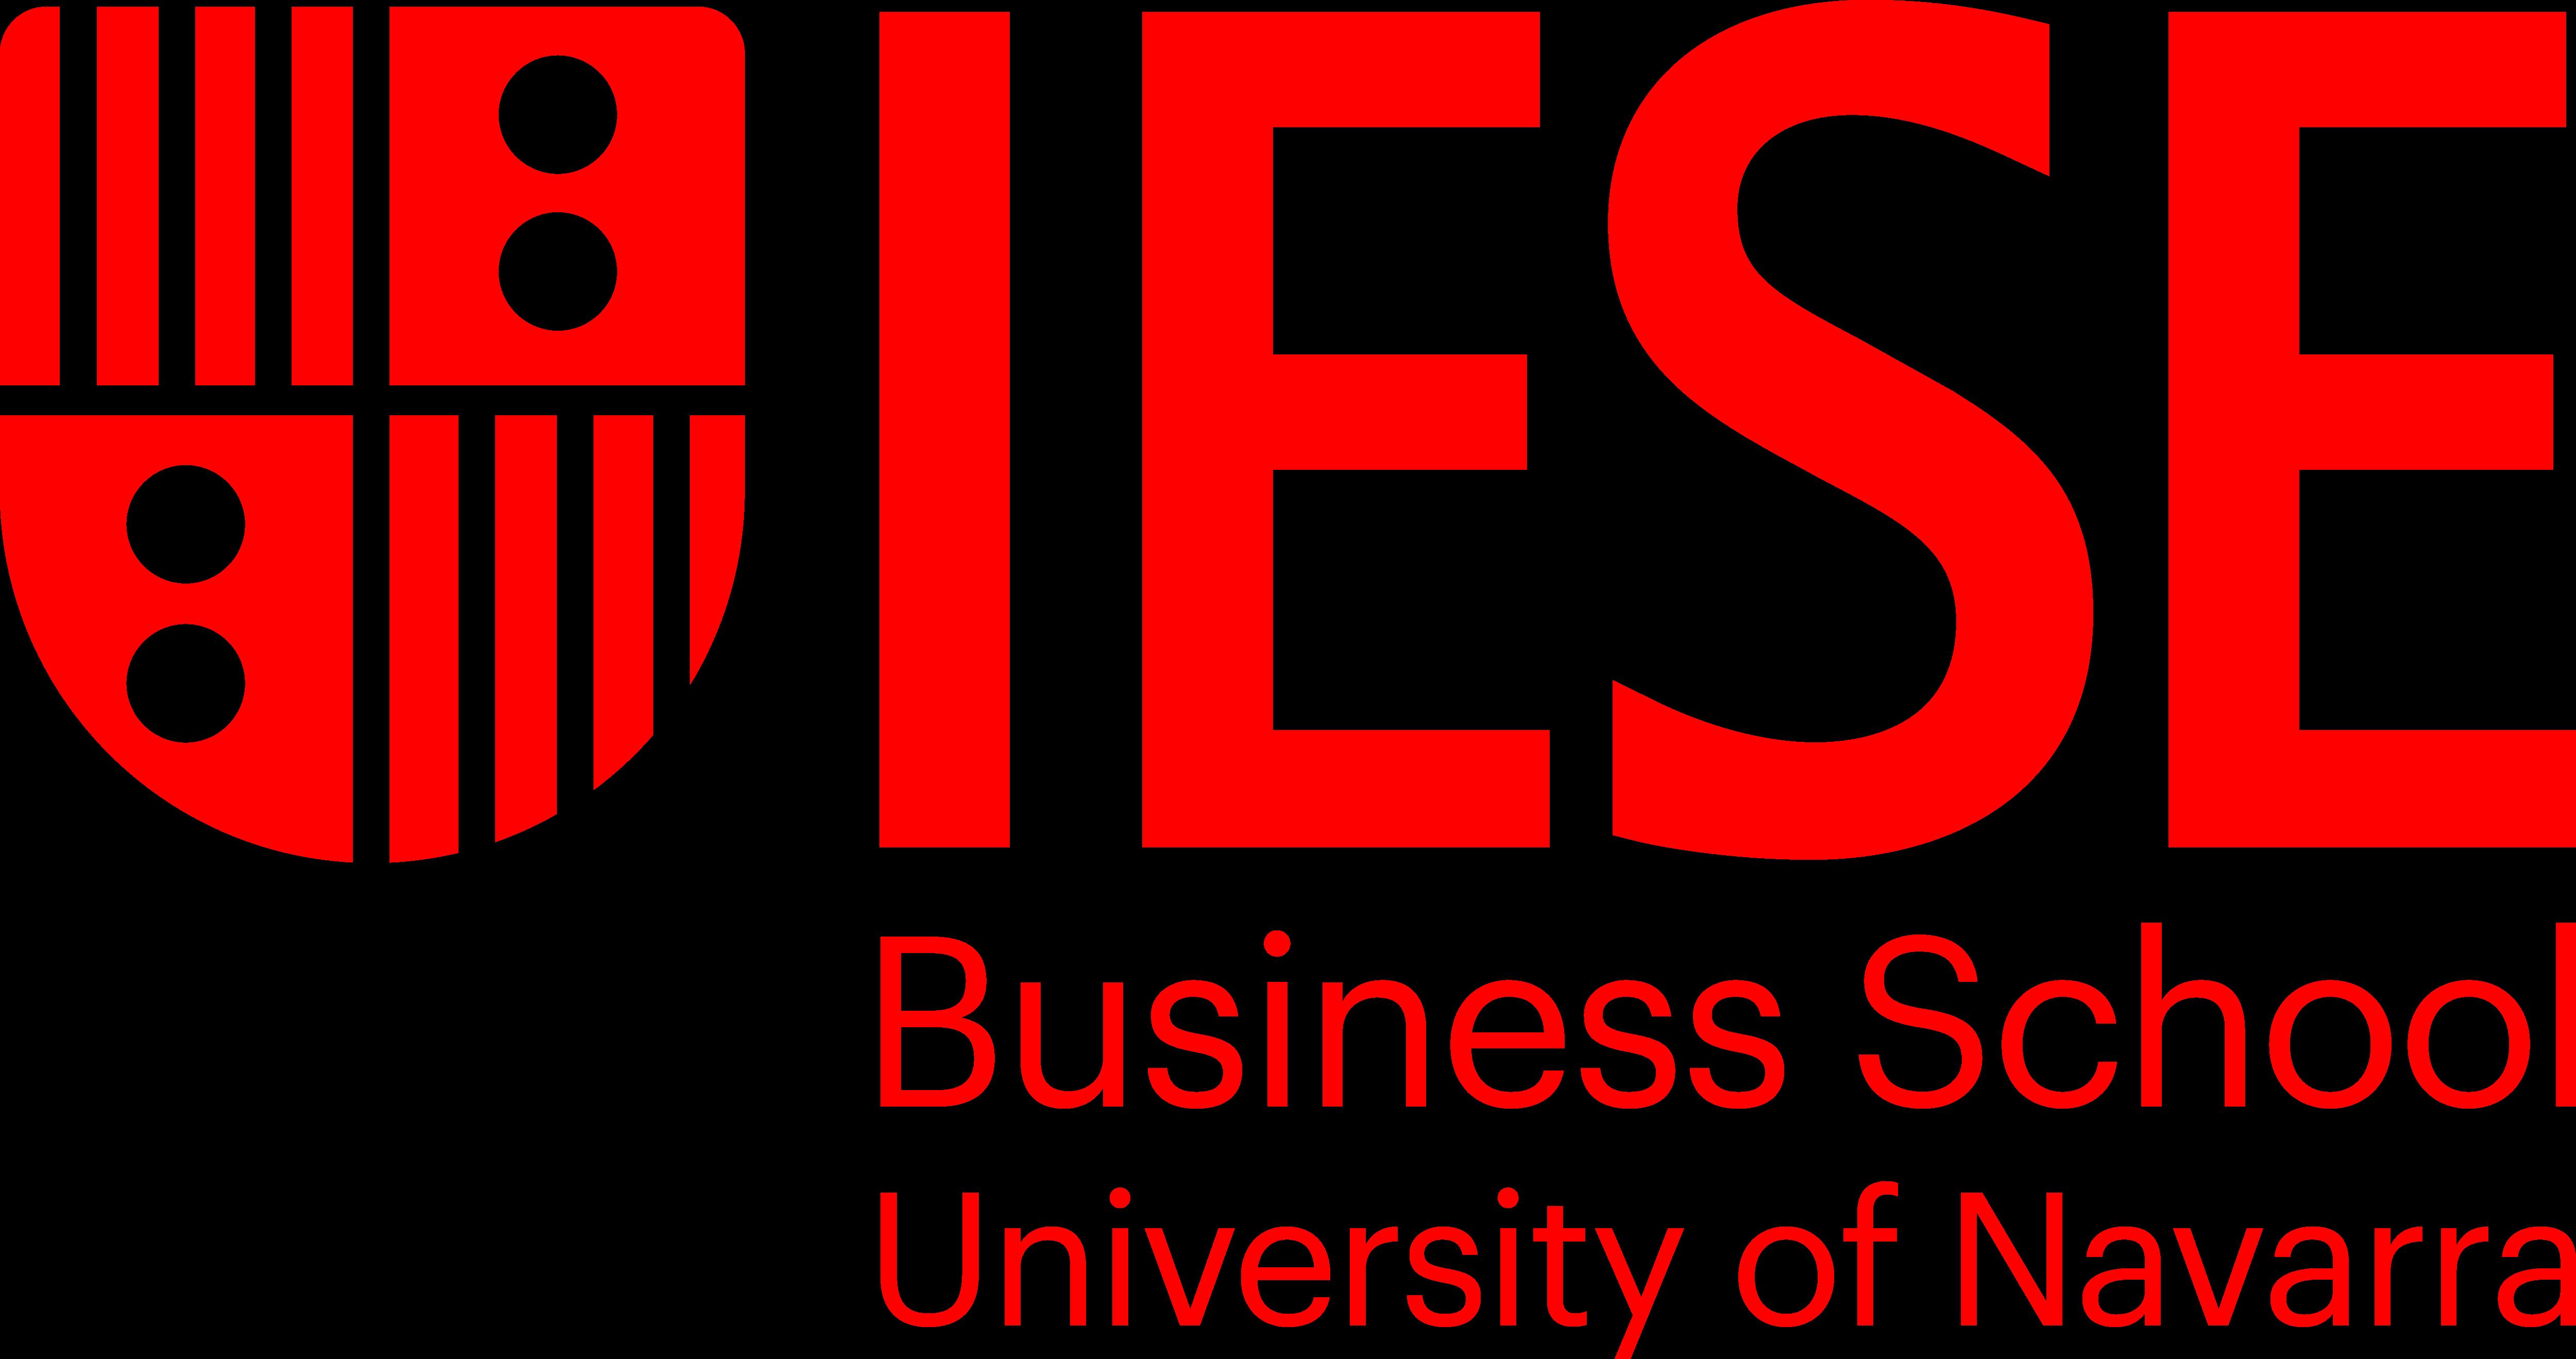 Iese Business School Logos Download